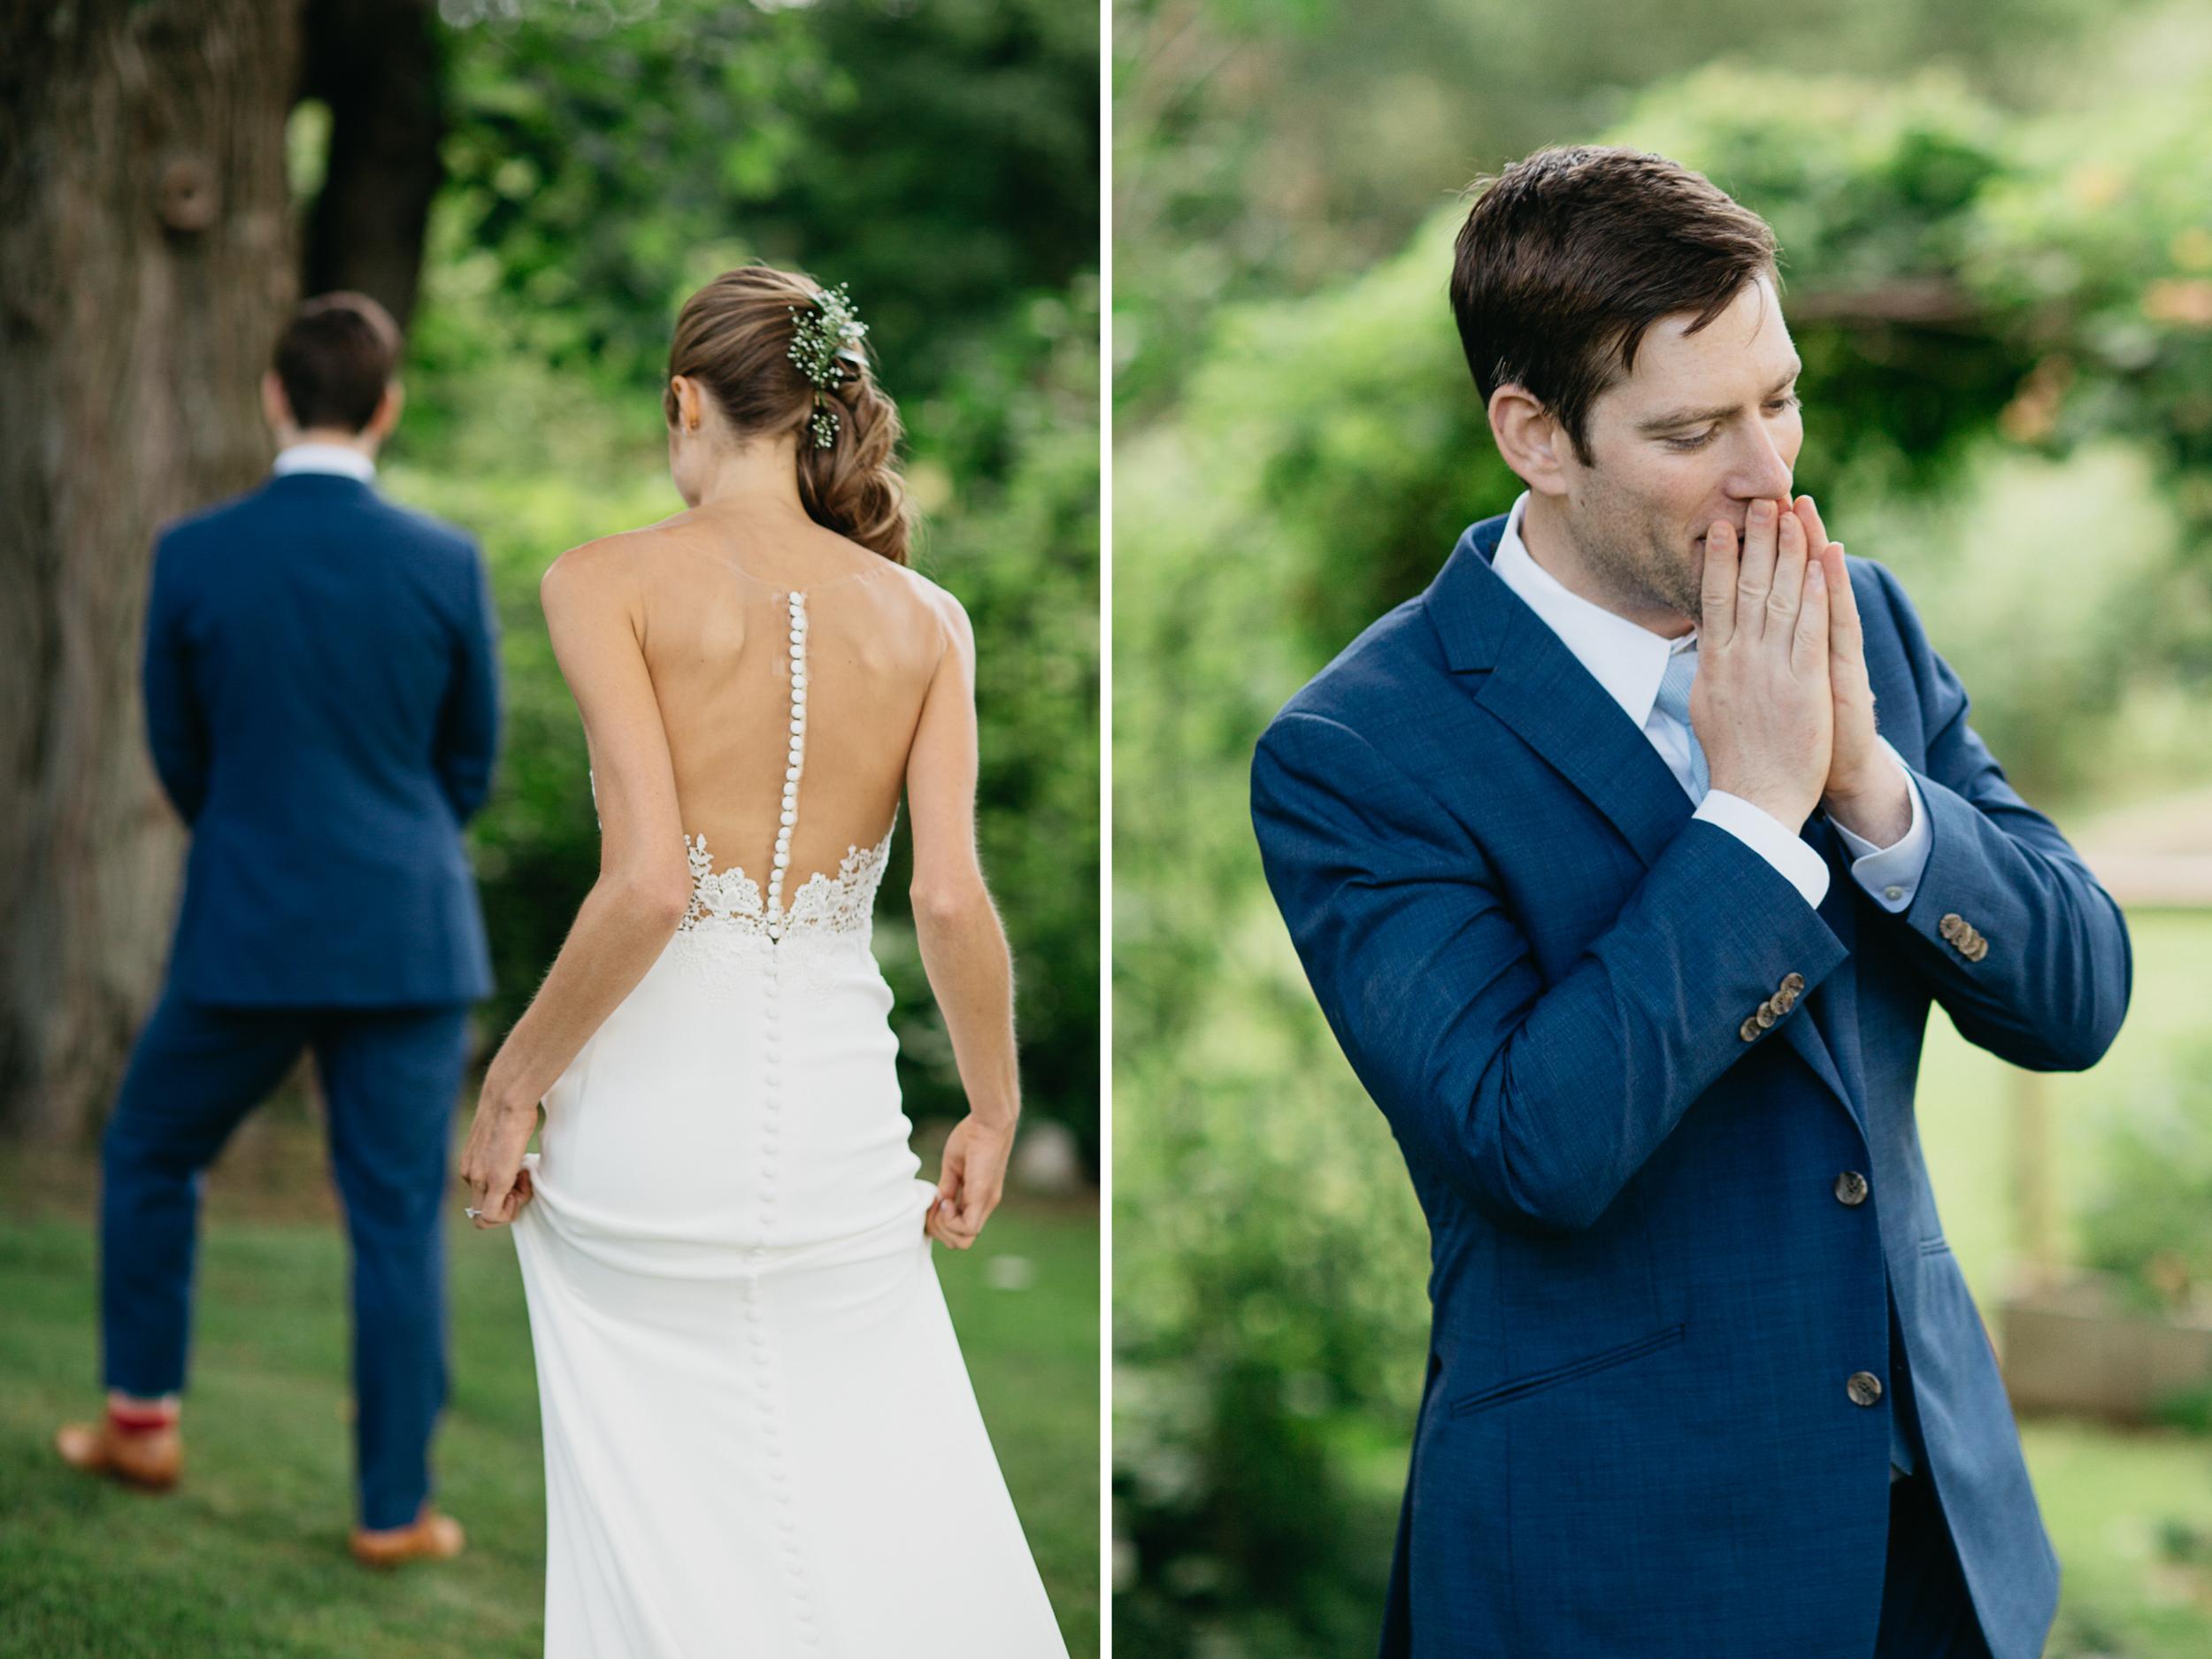 Karen_Alex_Bliss_ridge_farm_Vermont_wedding006.jpg